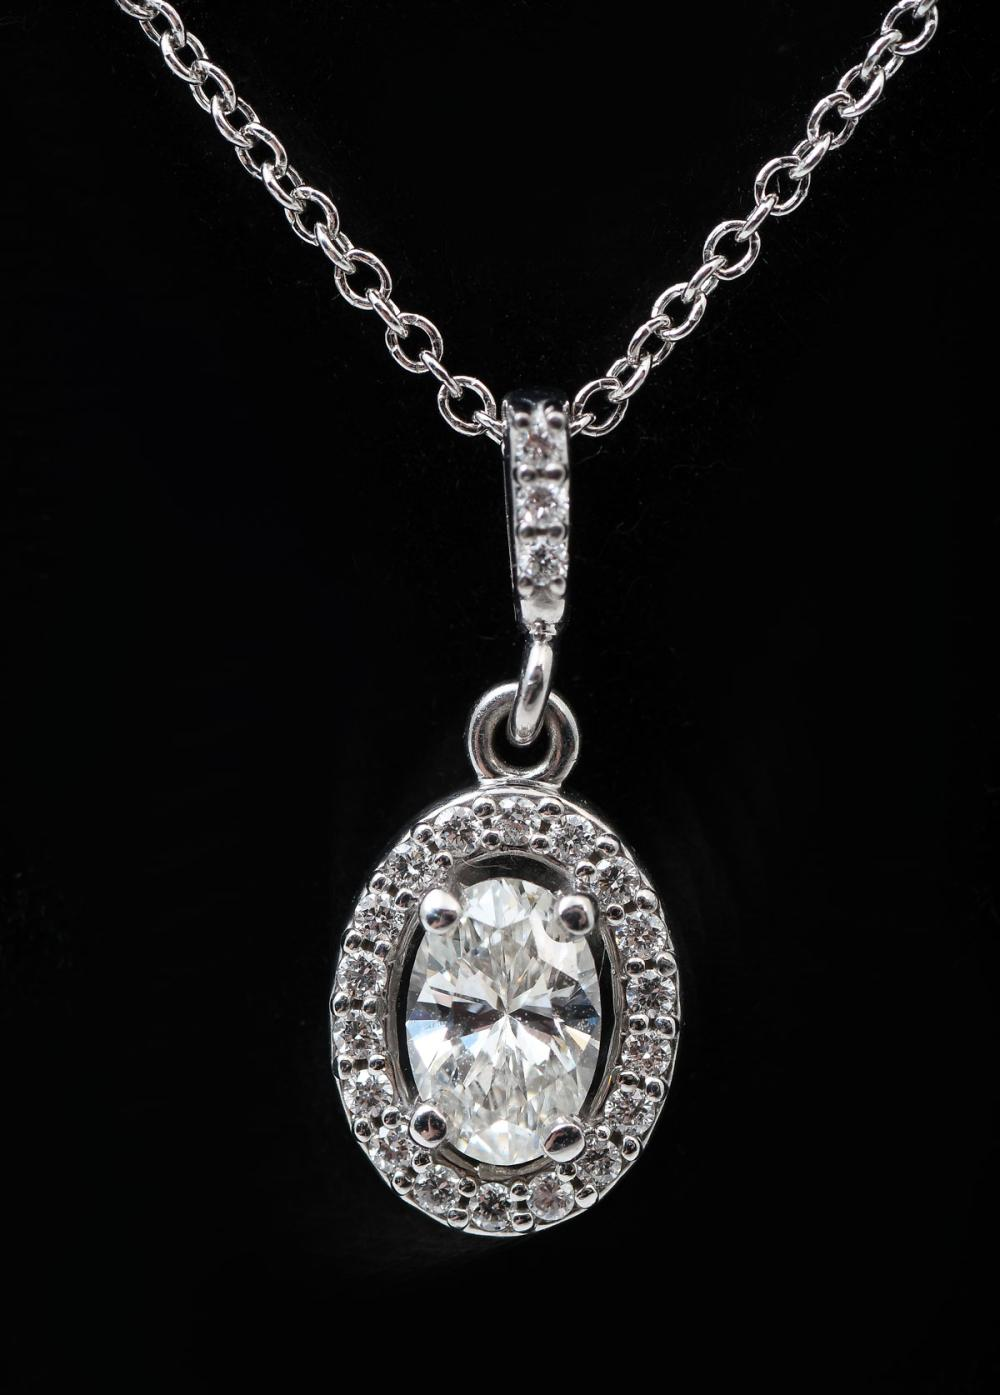 14K OVAL DIAMOND PENDANT WITH PLATINUM CHAIN